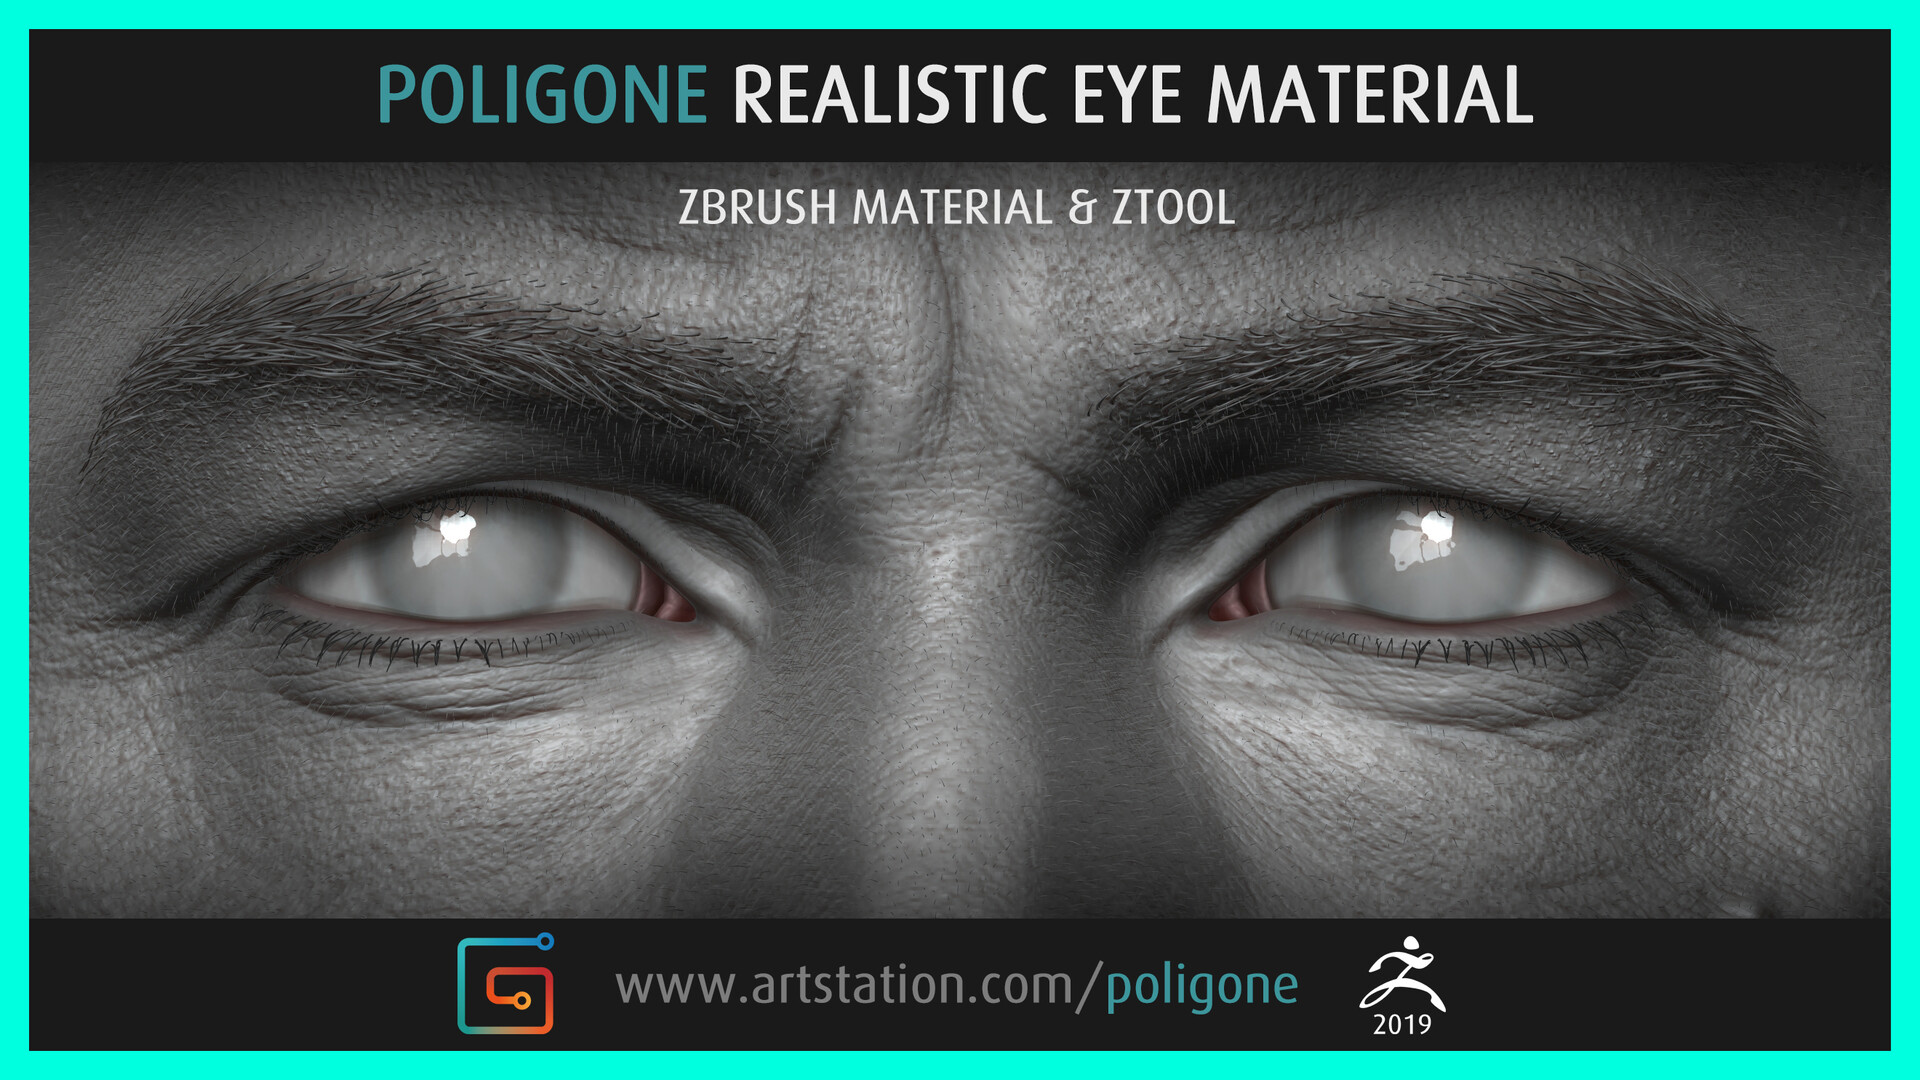 Poligone cg 1